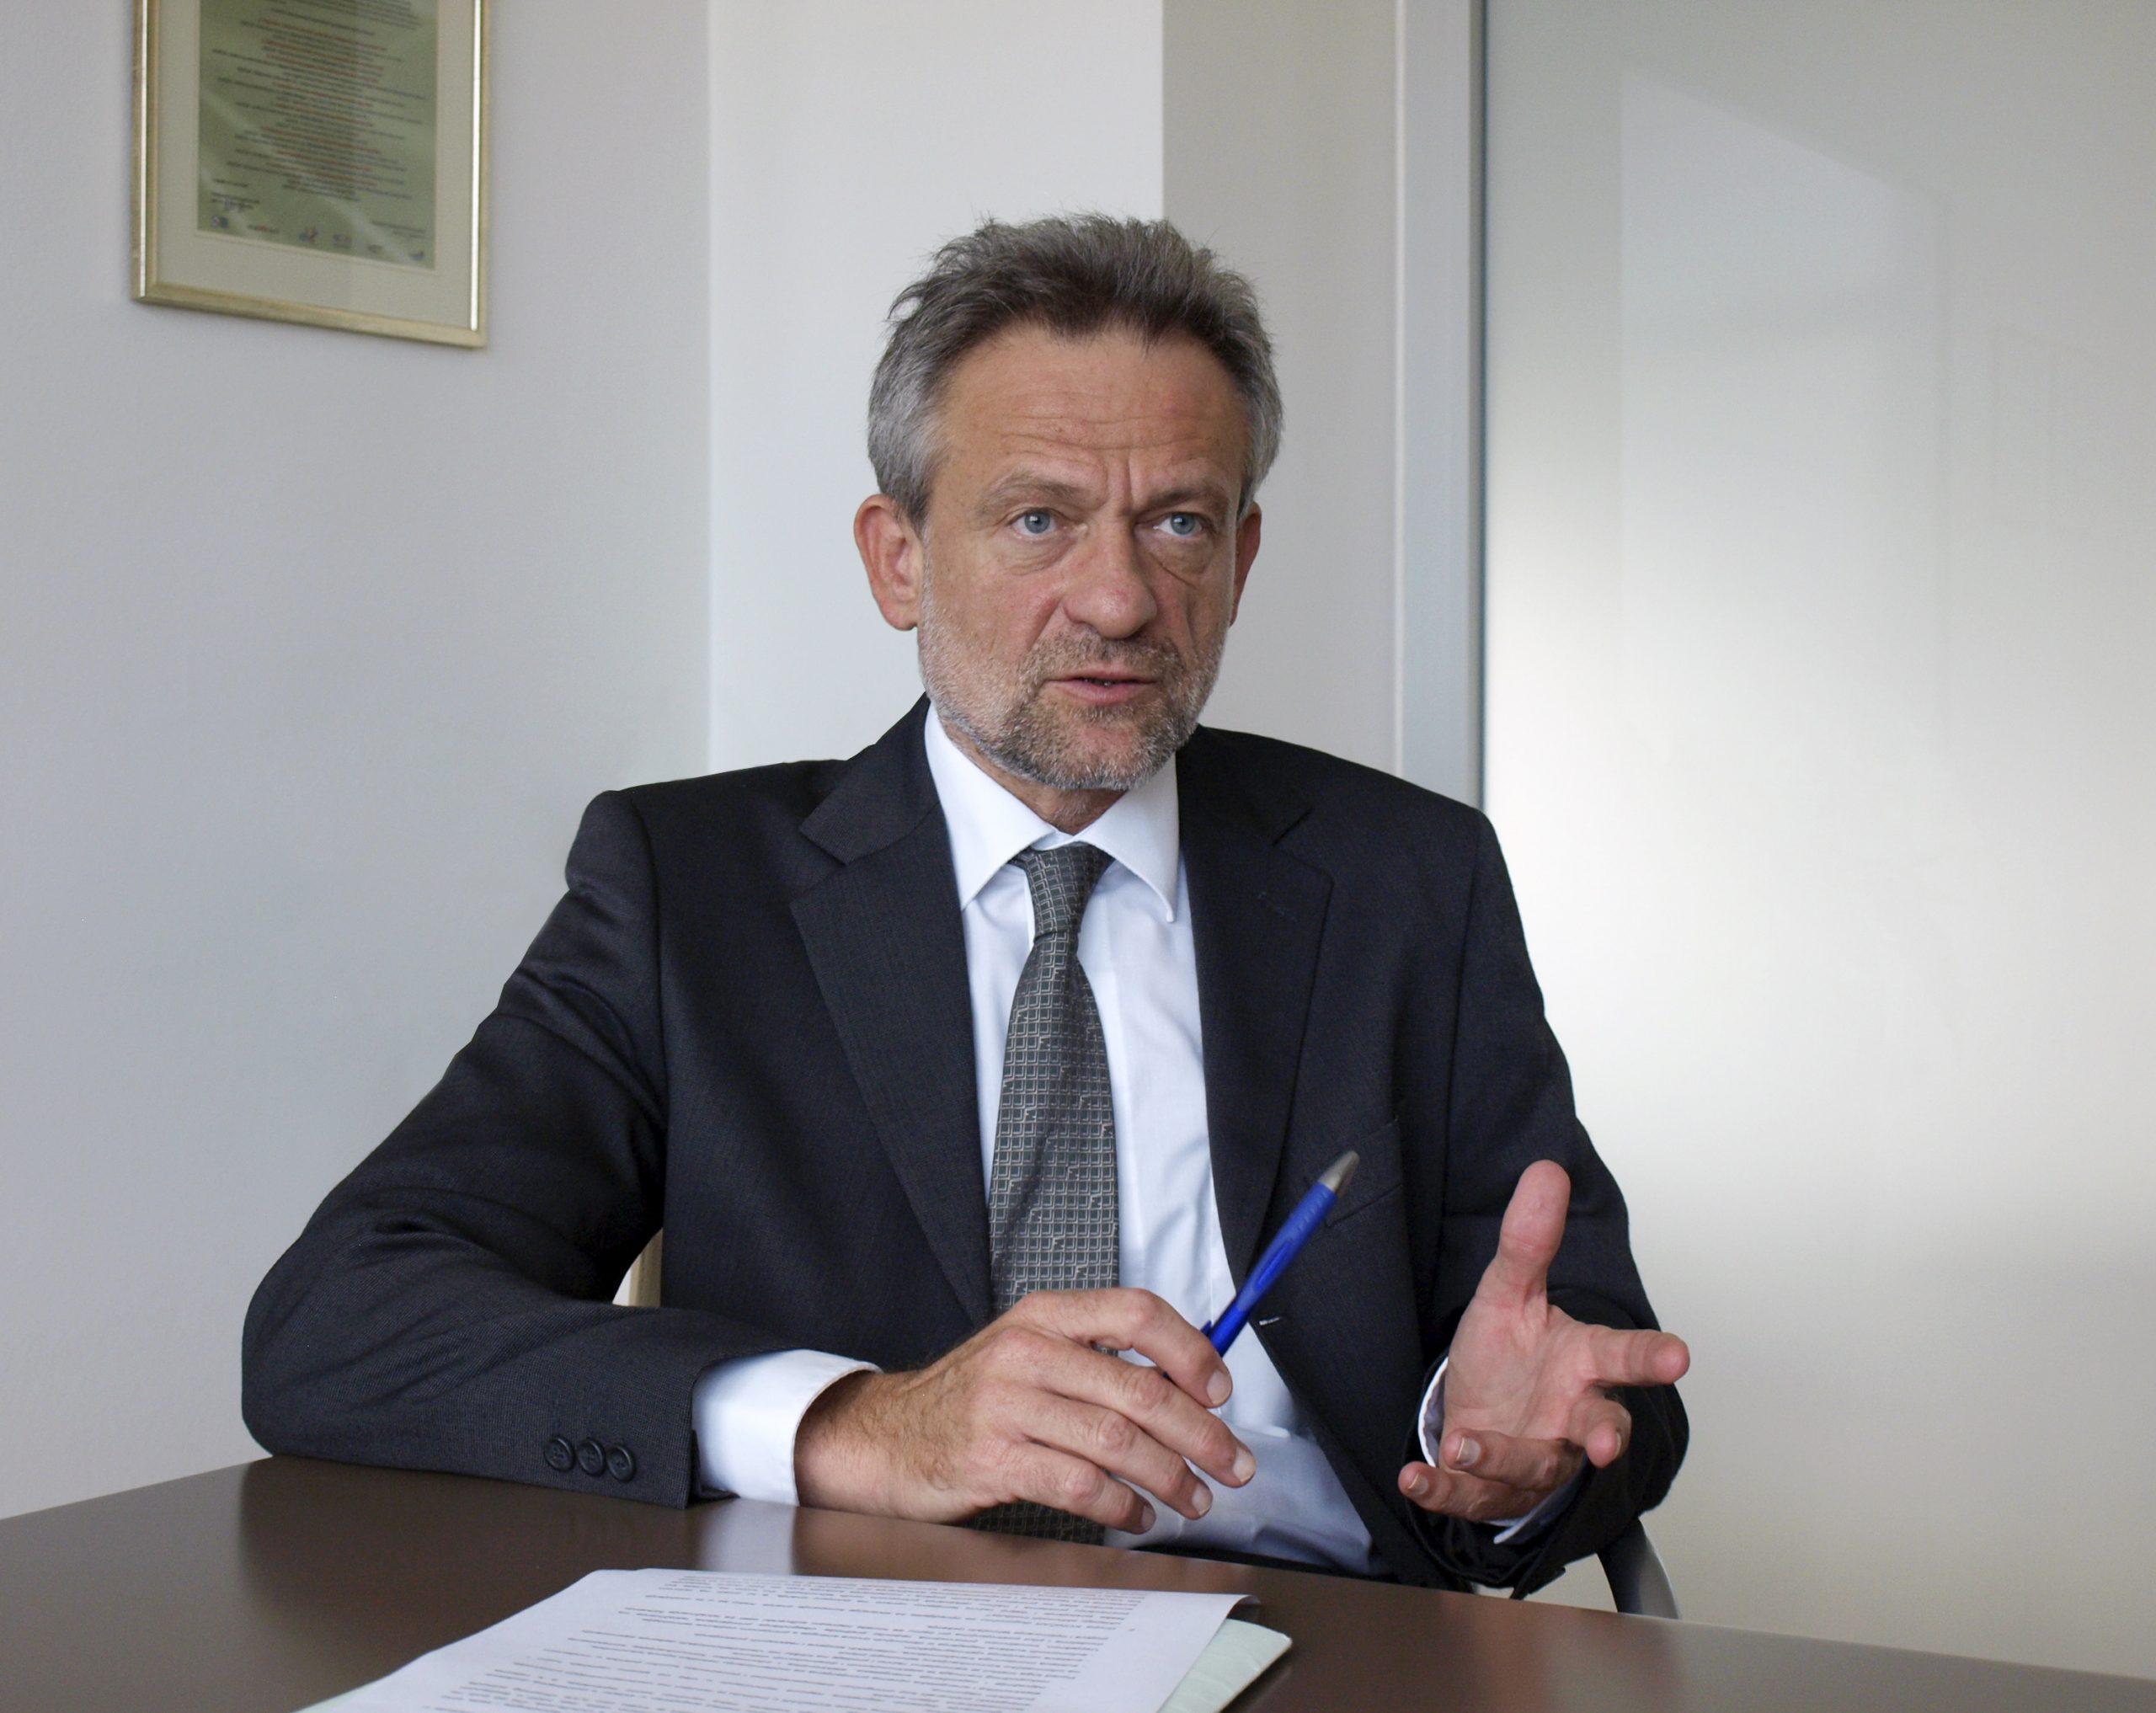 Siniša Marijan, CEO, Končar - Institut za elektrotehniku 1 - hrpsor Hrvatski poslovni savjet za održivi razvoj